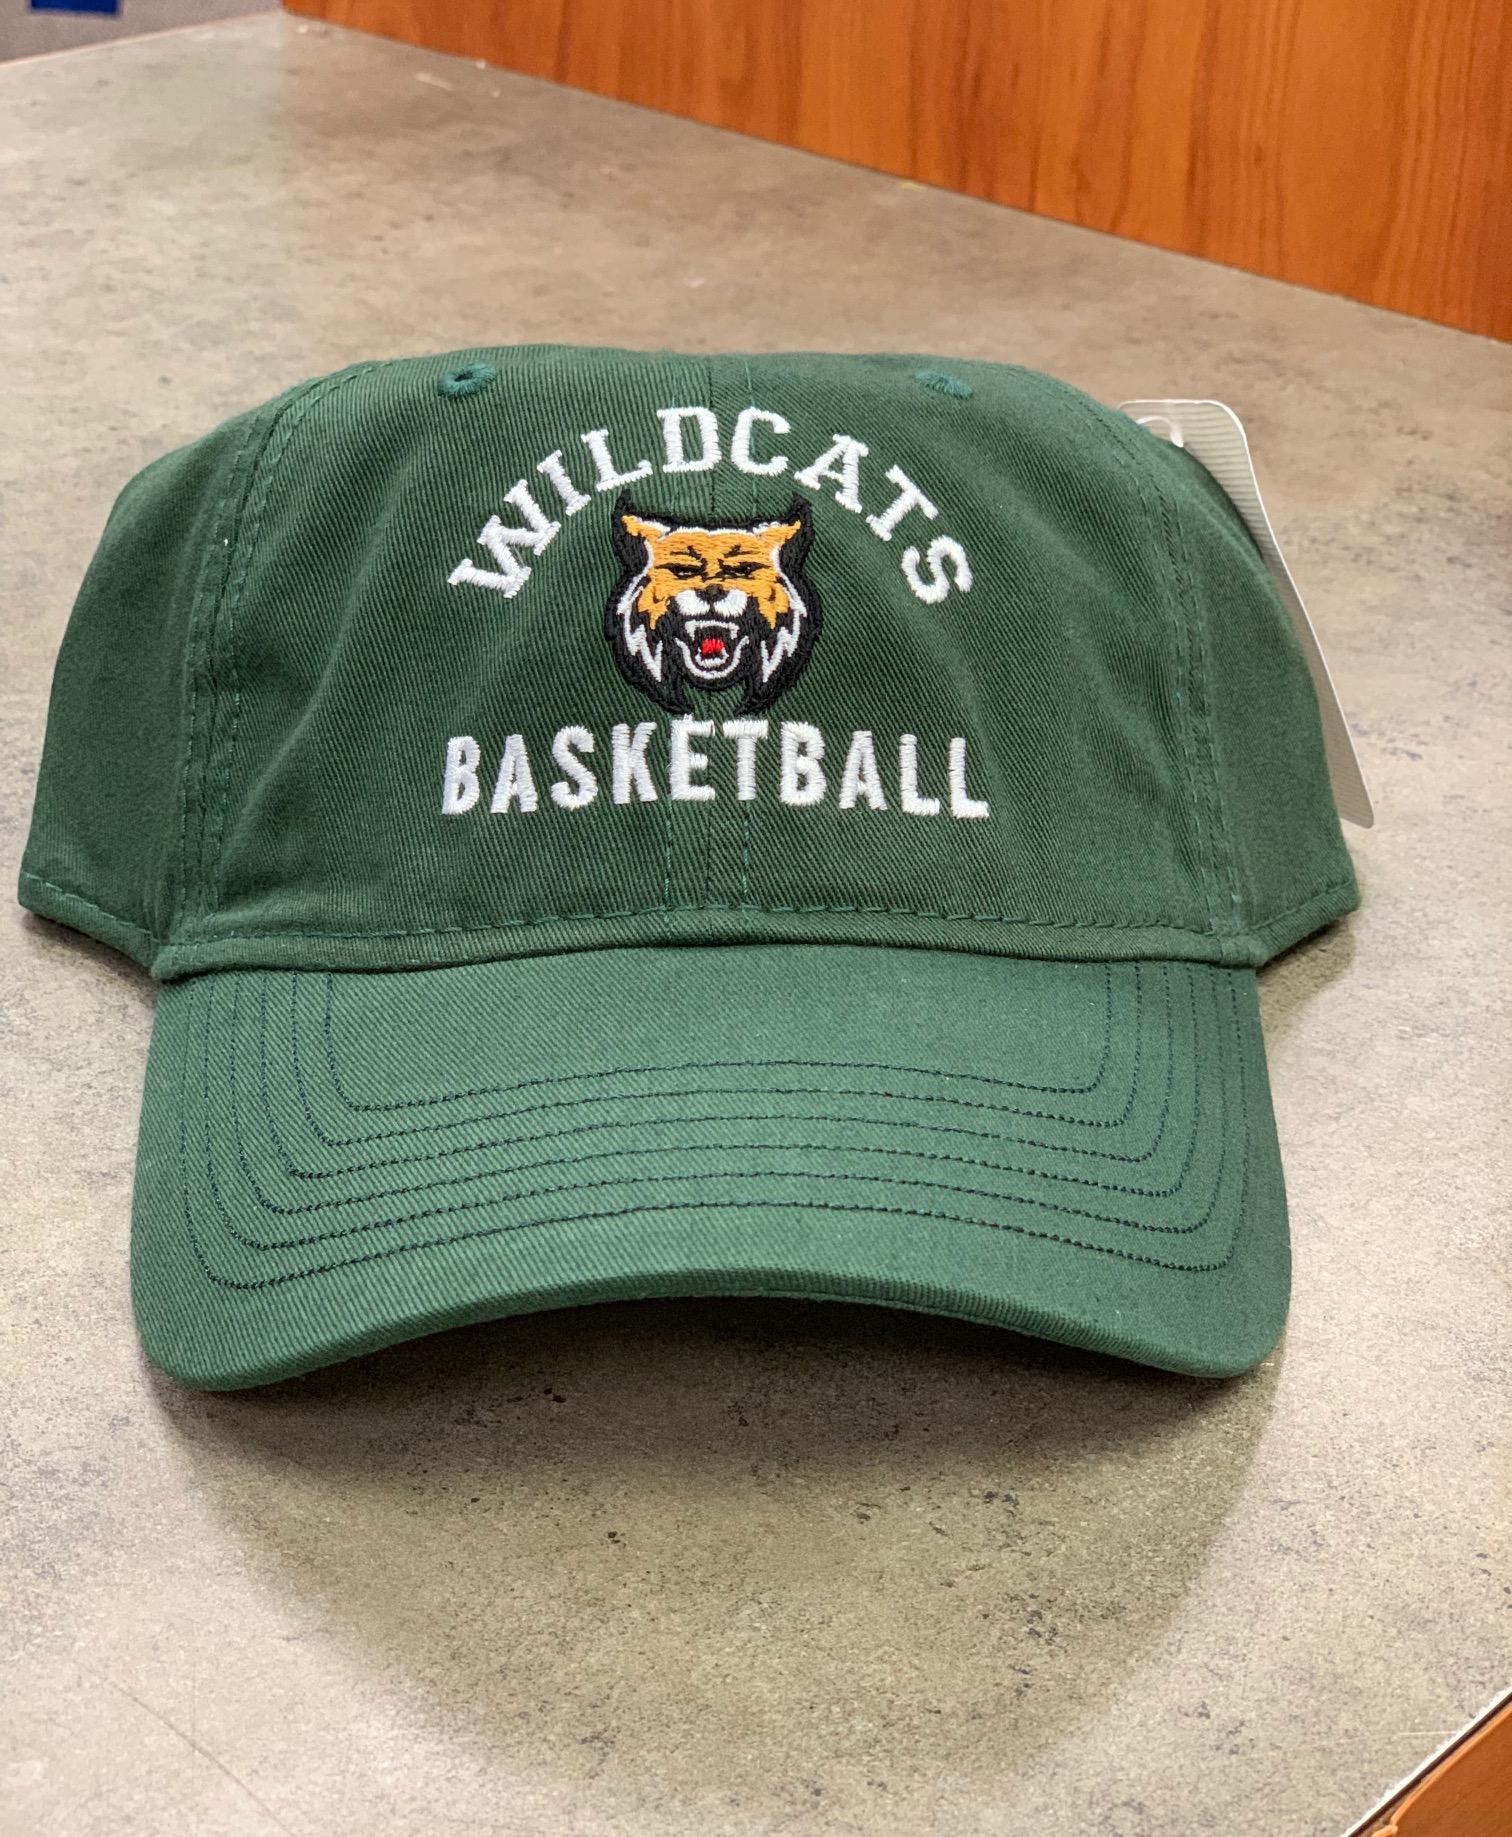 Wildcats Basketball Cap